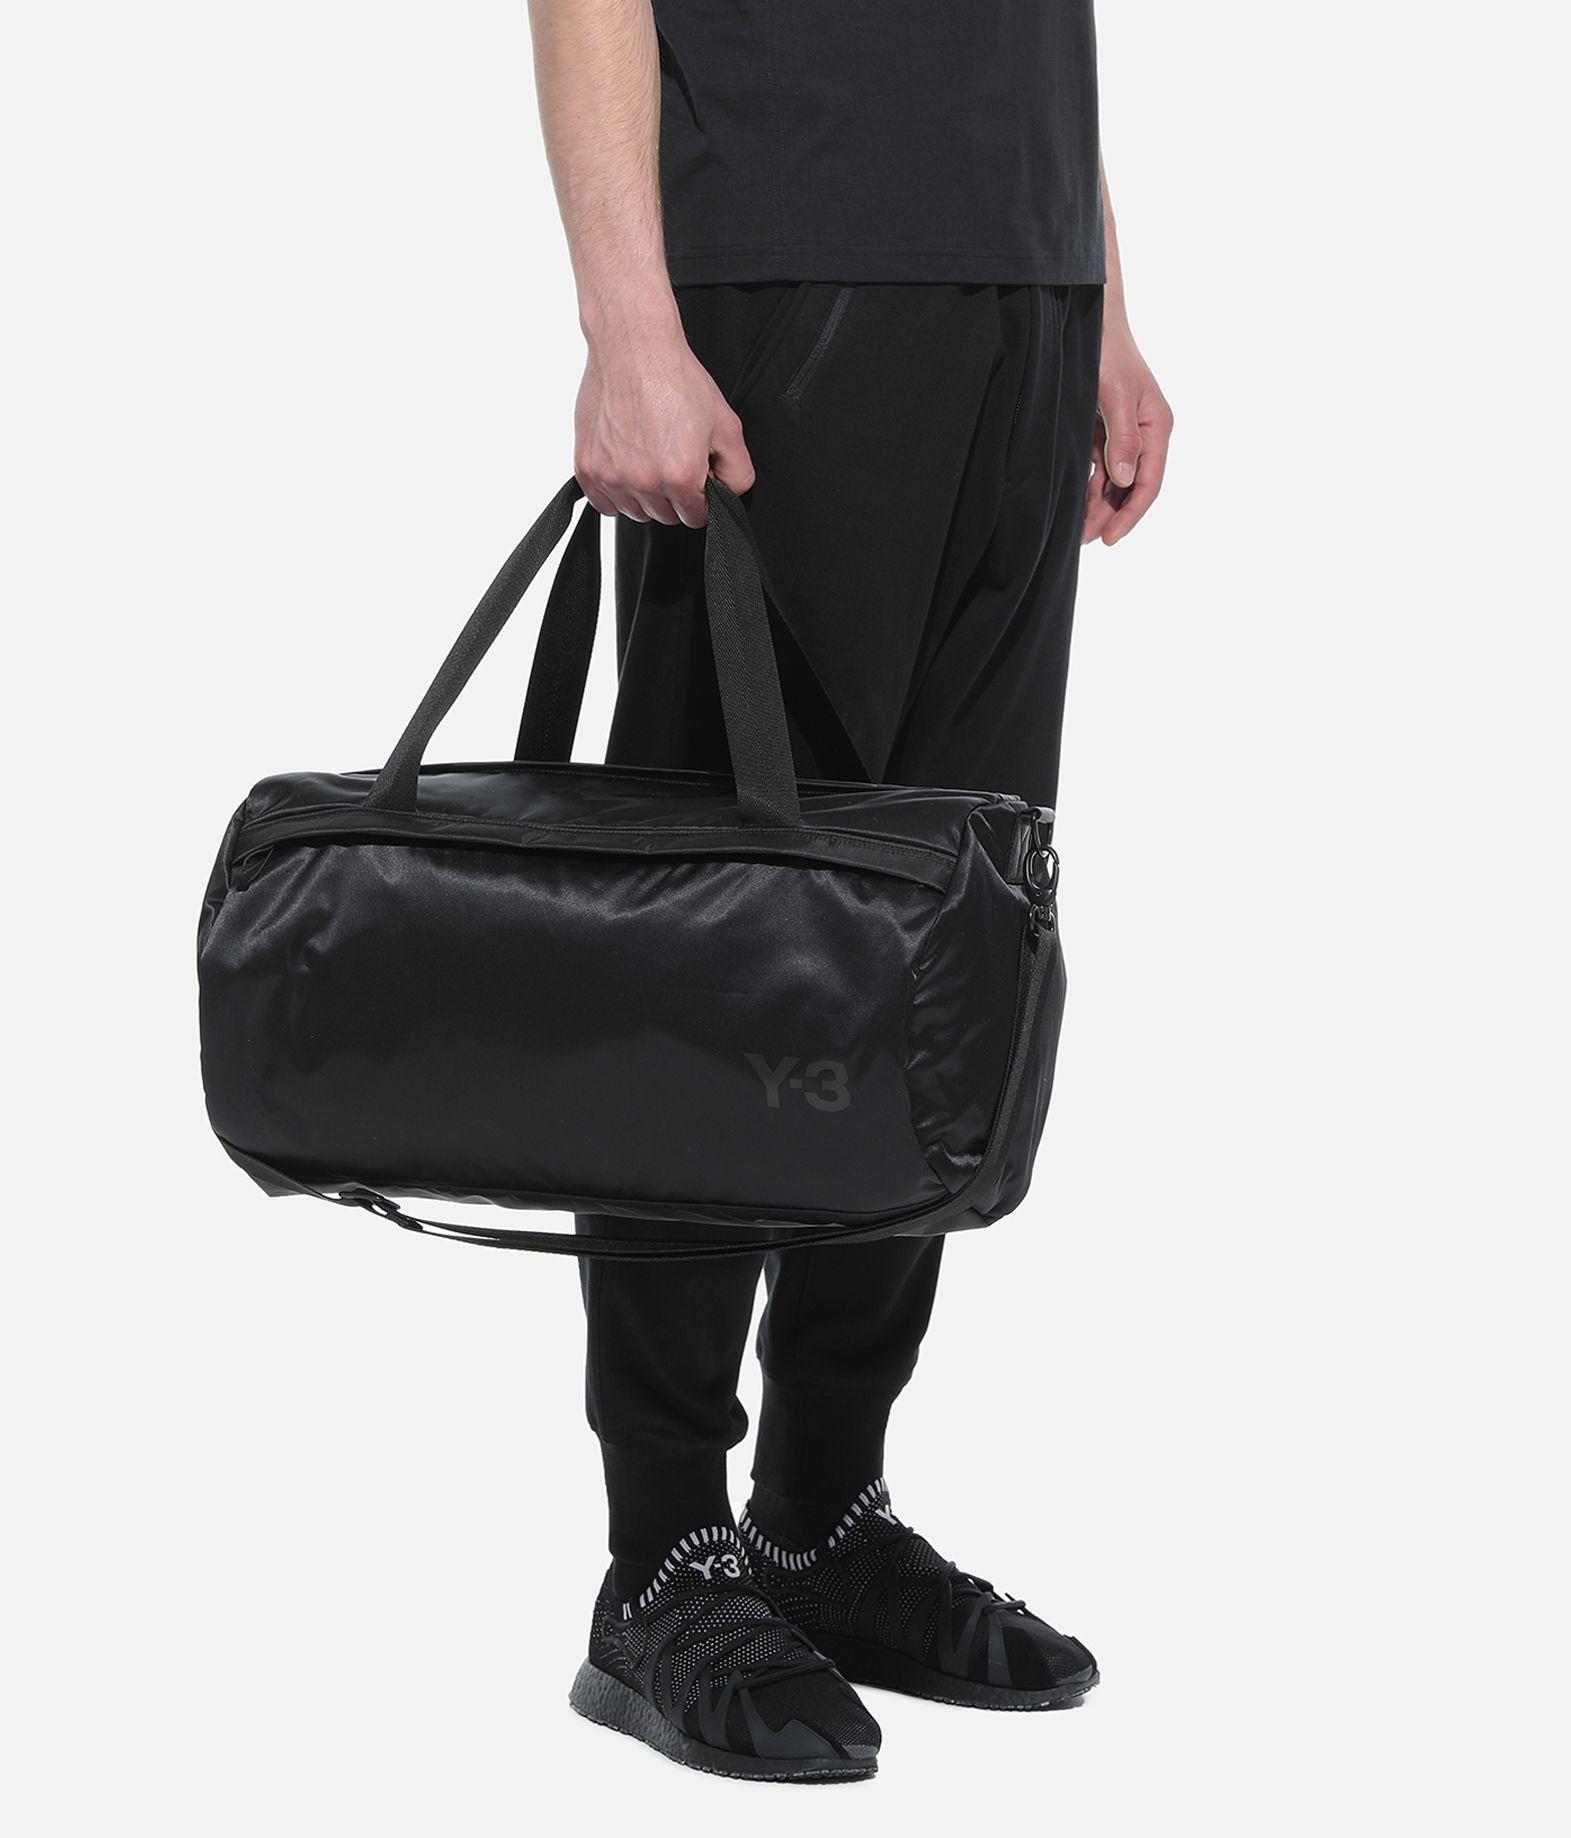 Y-3 Y-3 Gym Bag Gym bag E r